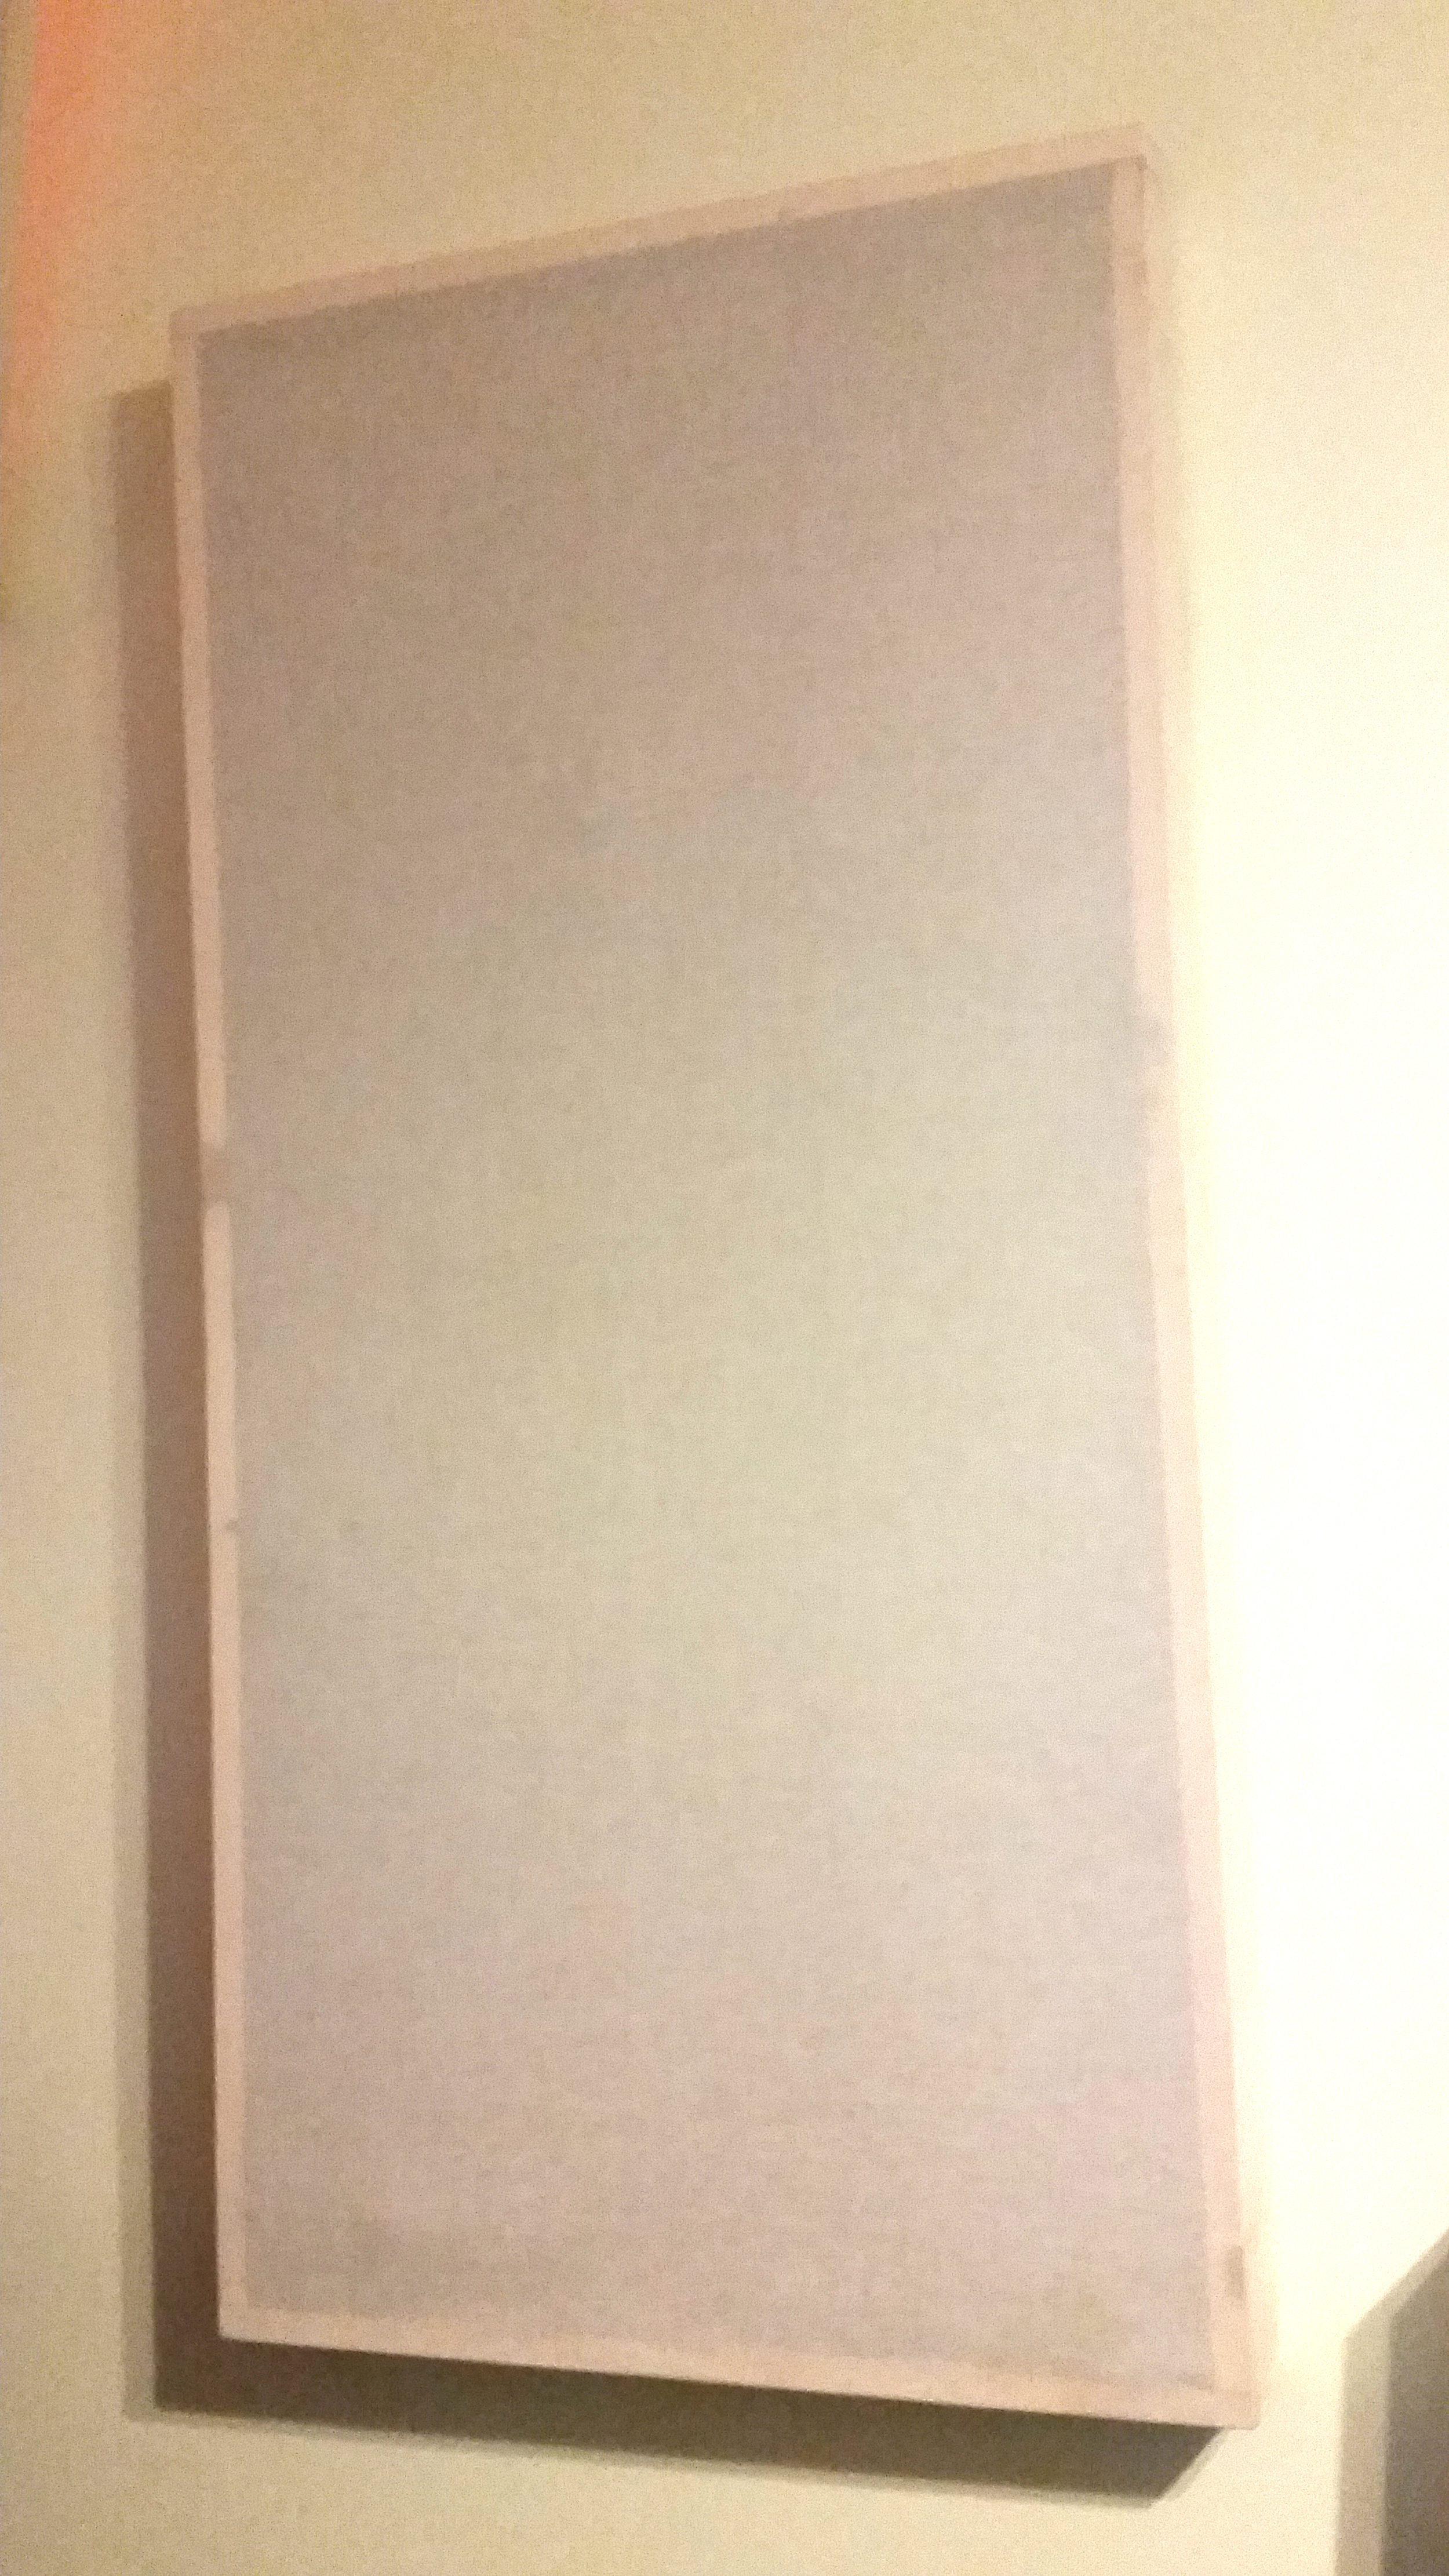 SOUND panel Wall.jpg